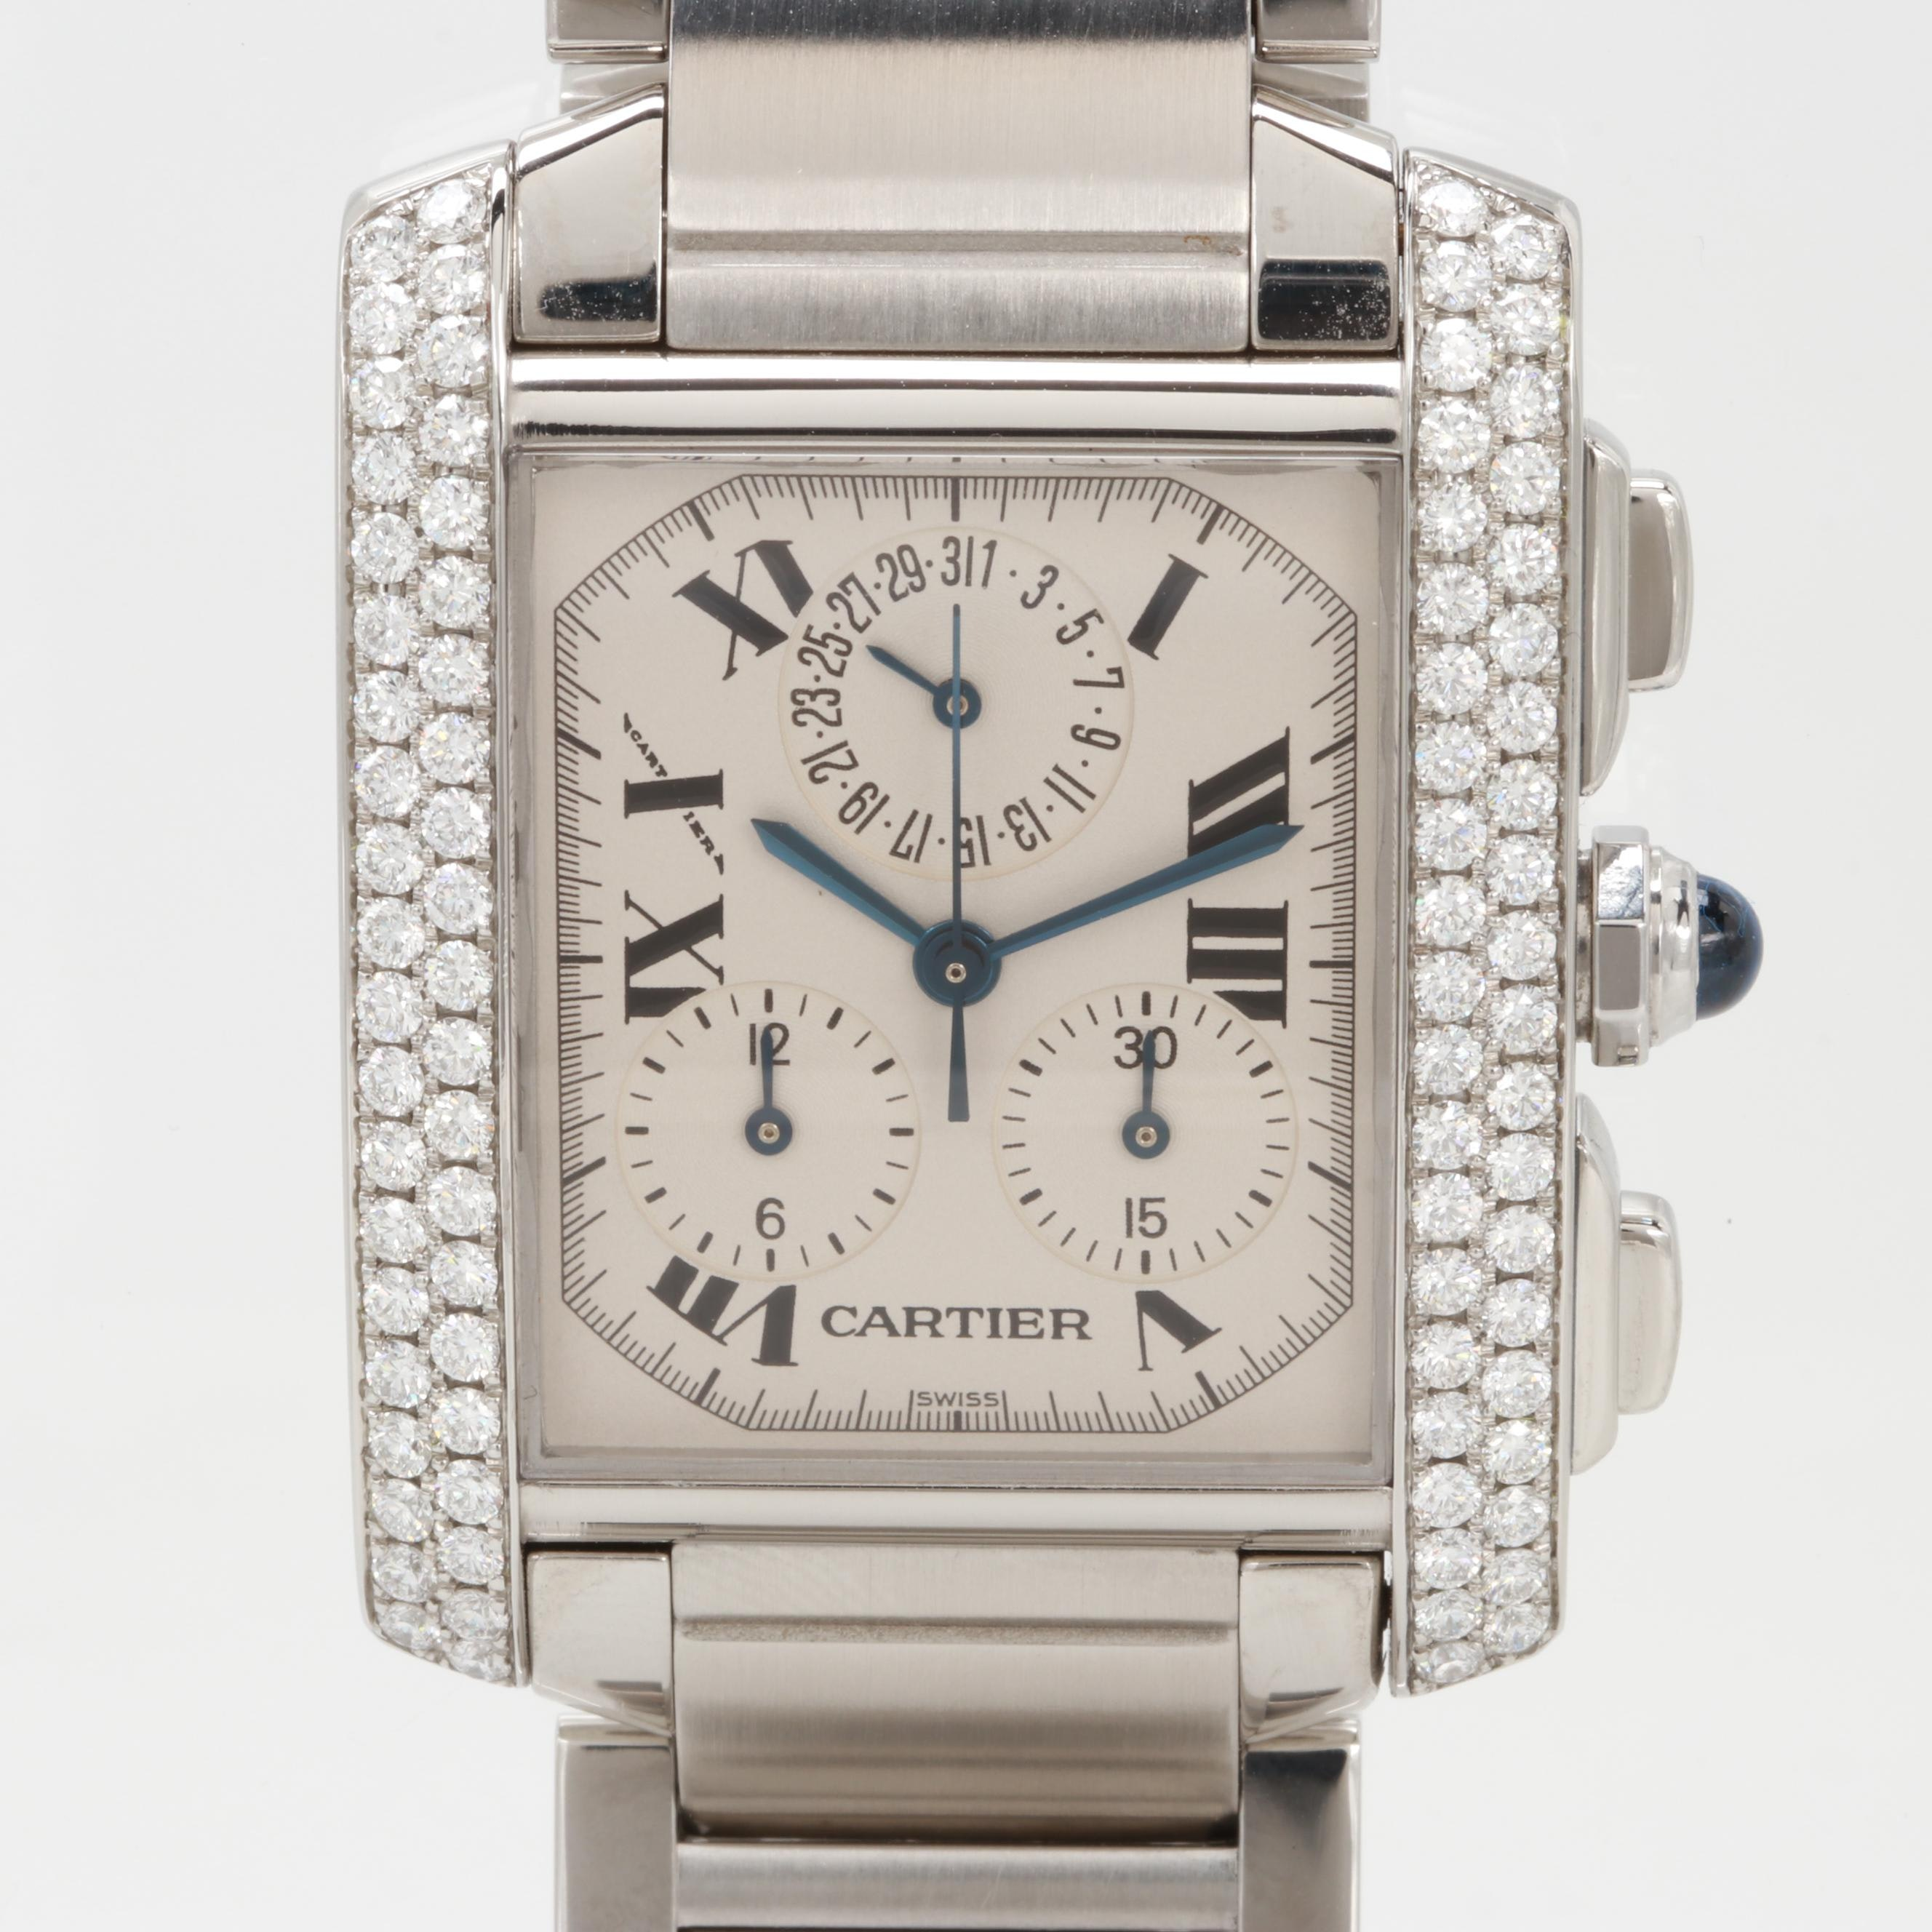 Cartier Tank Francaise Chronograph Wristwatch With 1.64 CTW Diamond Bezel